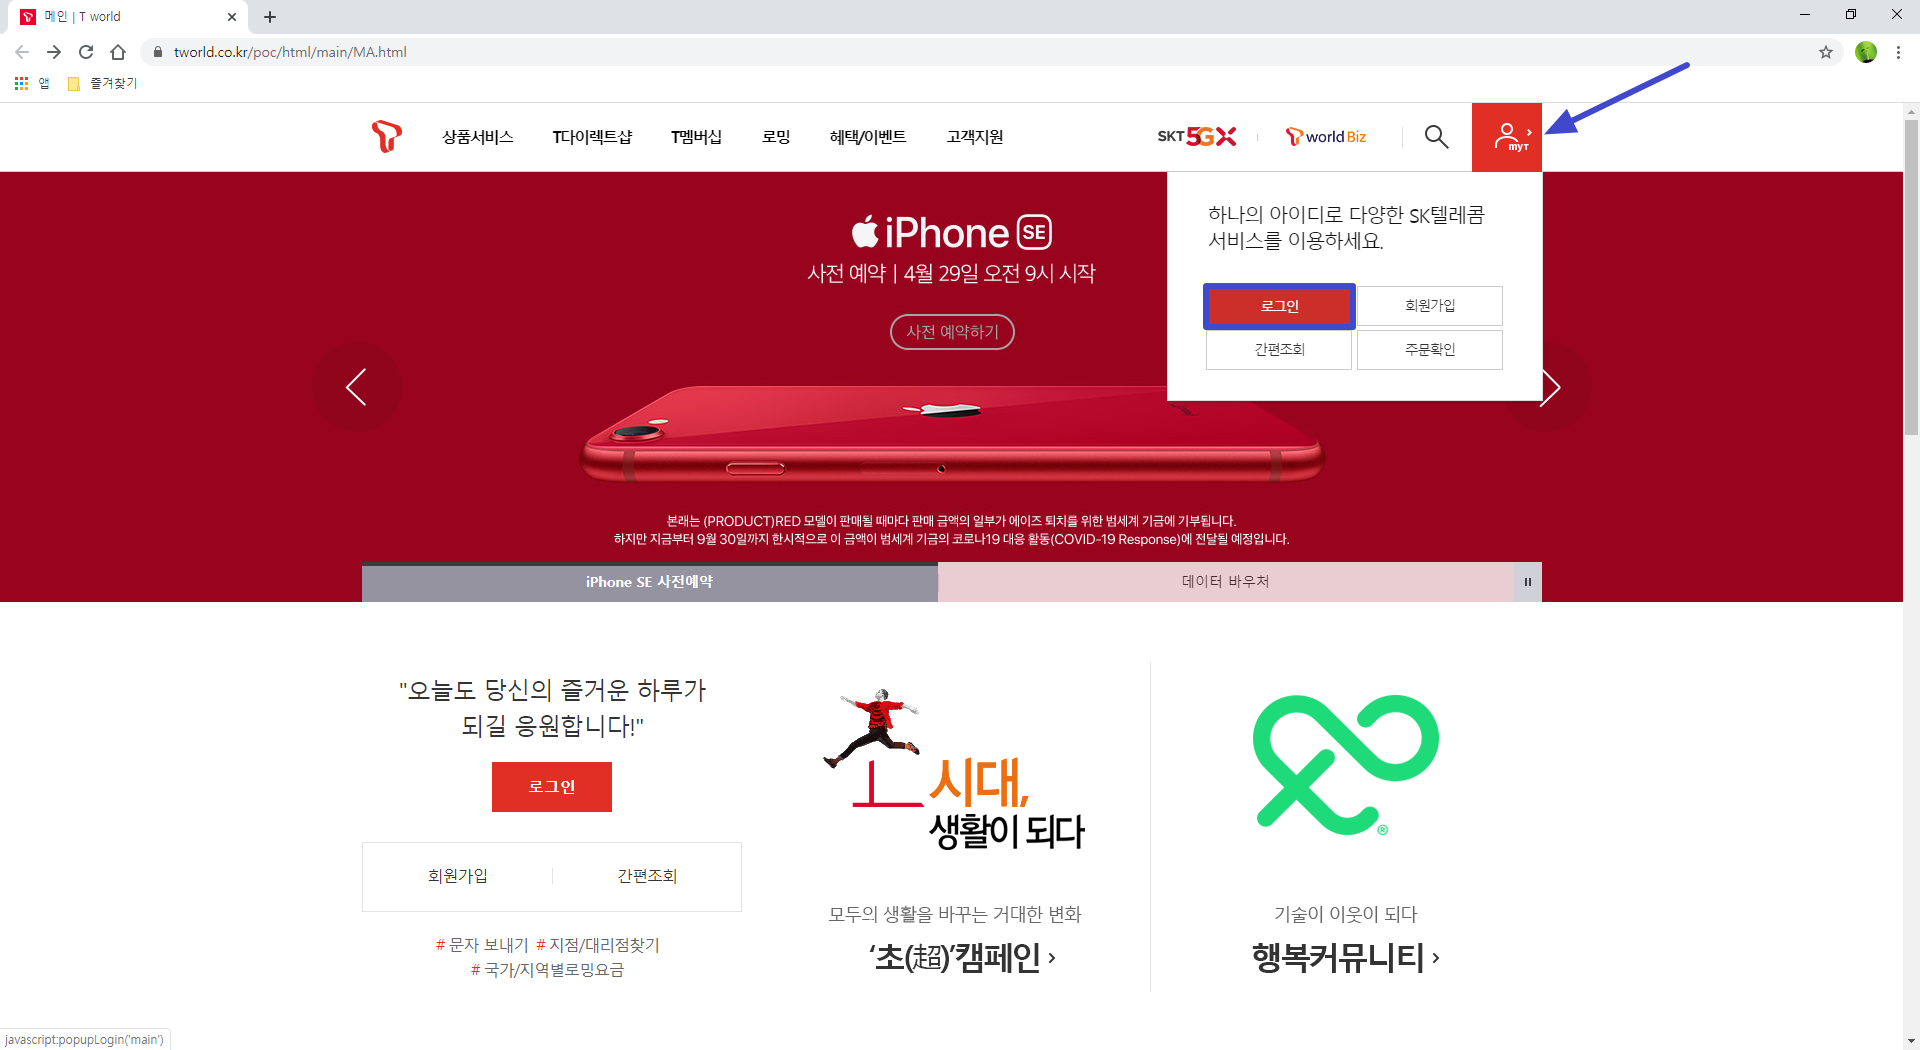 SK T다이렉트 샵 휴대폰 구매 방법과 구매 후기